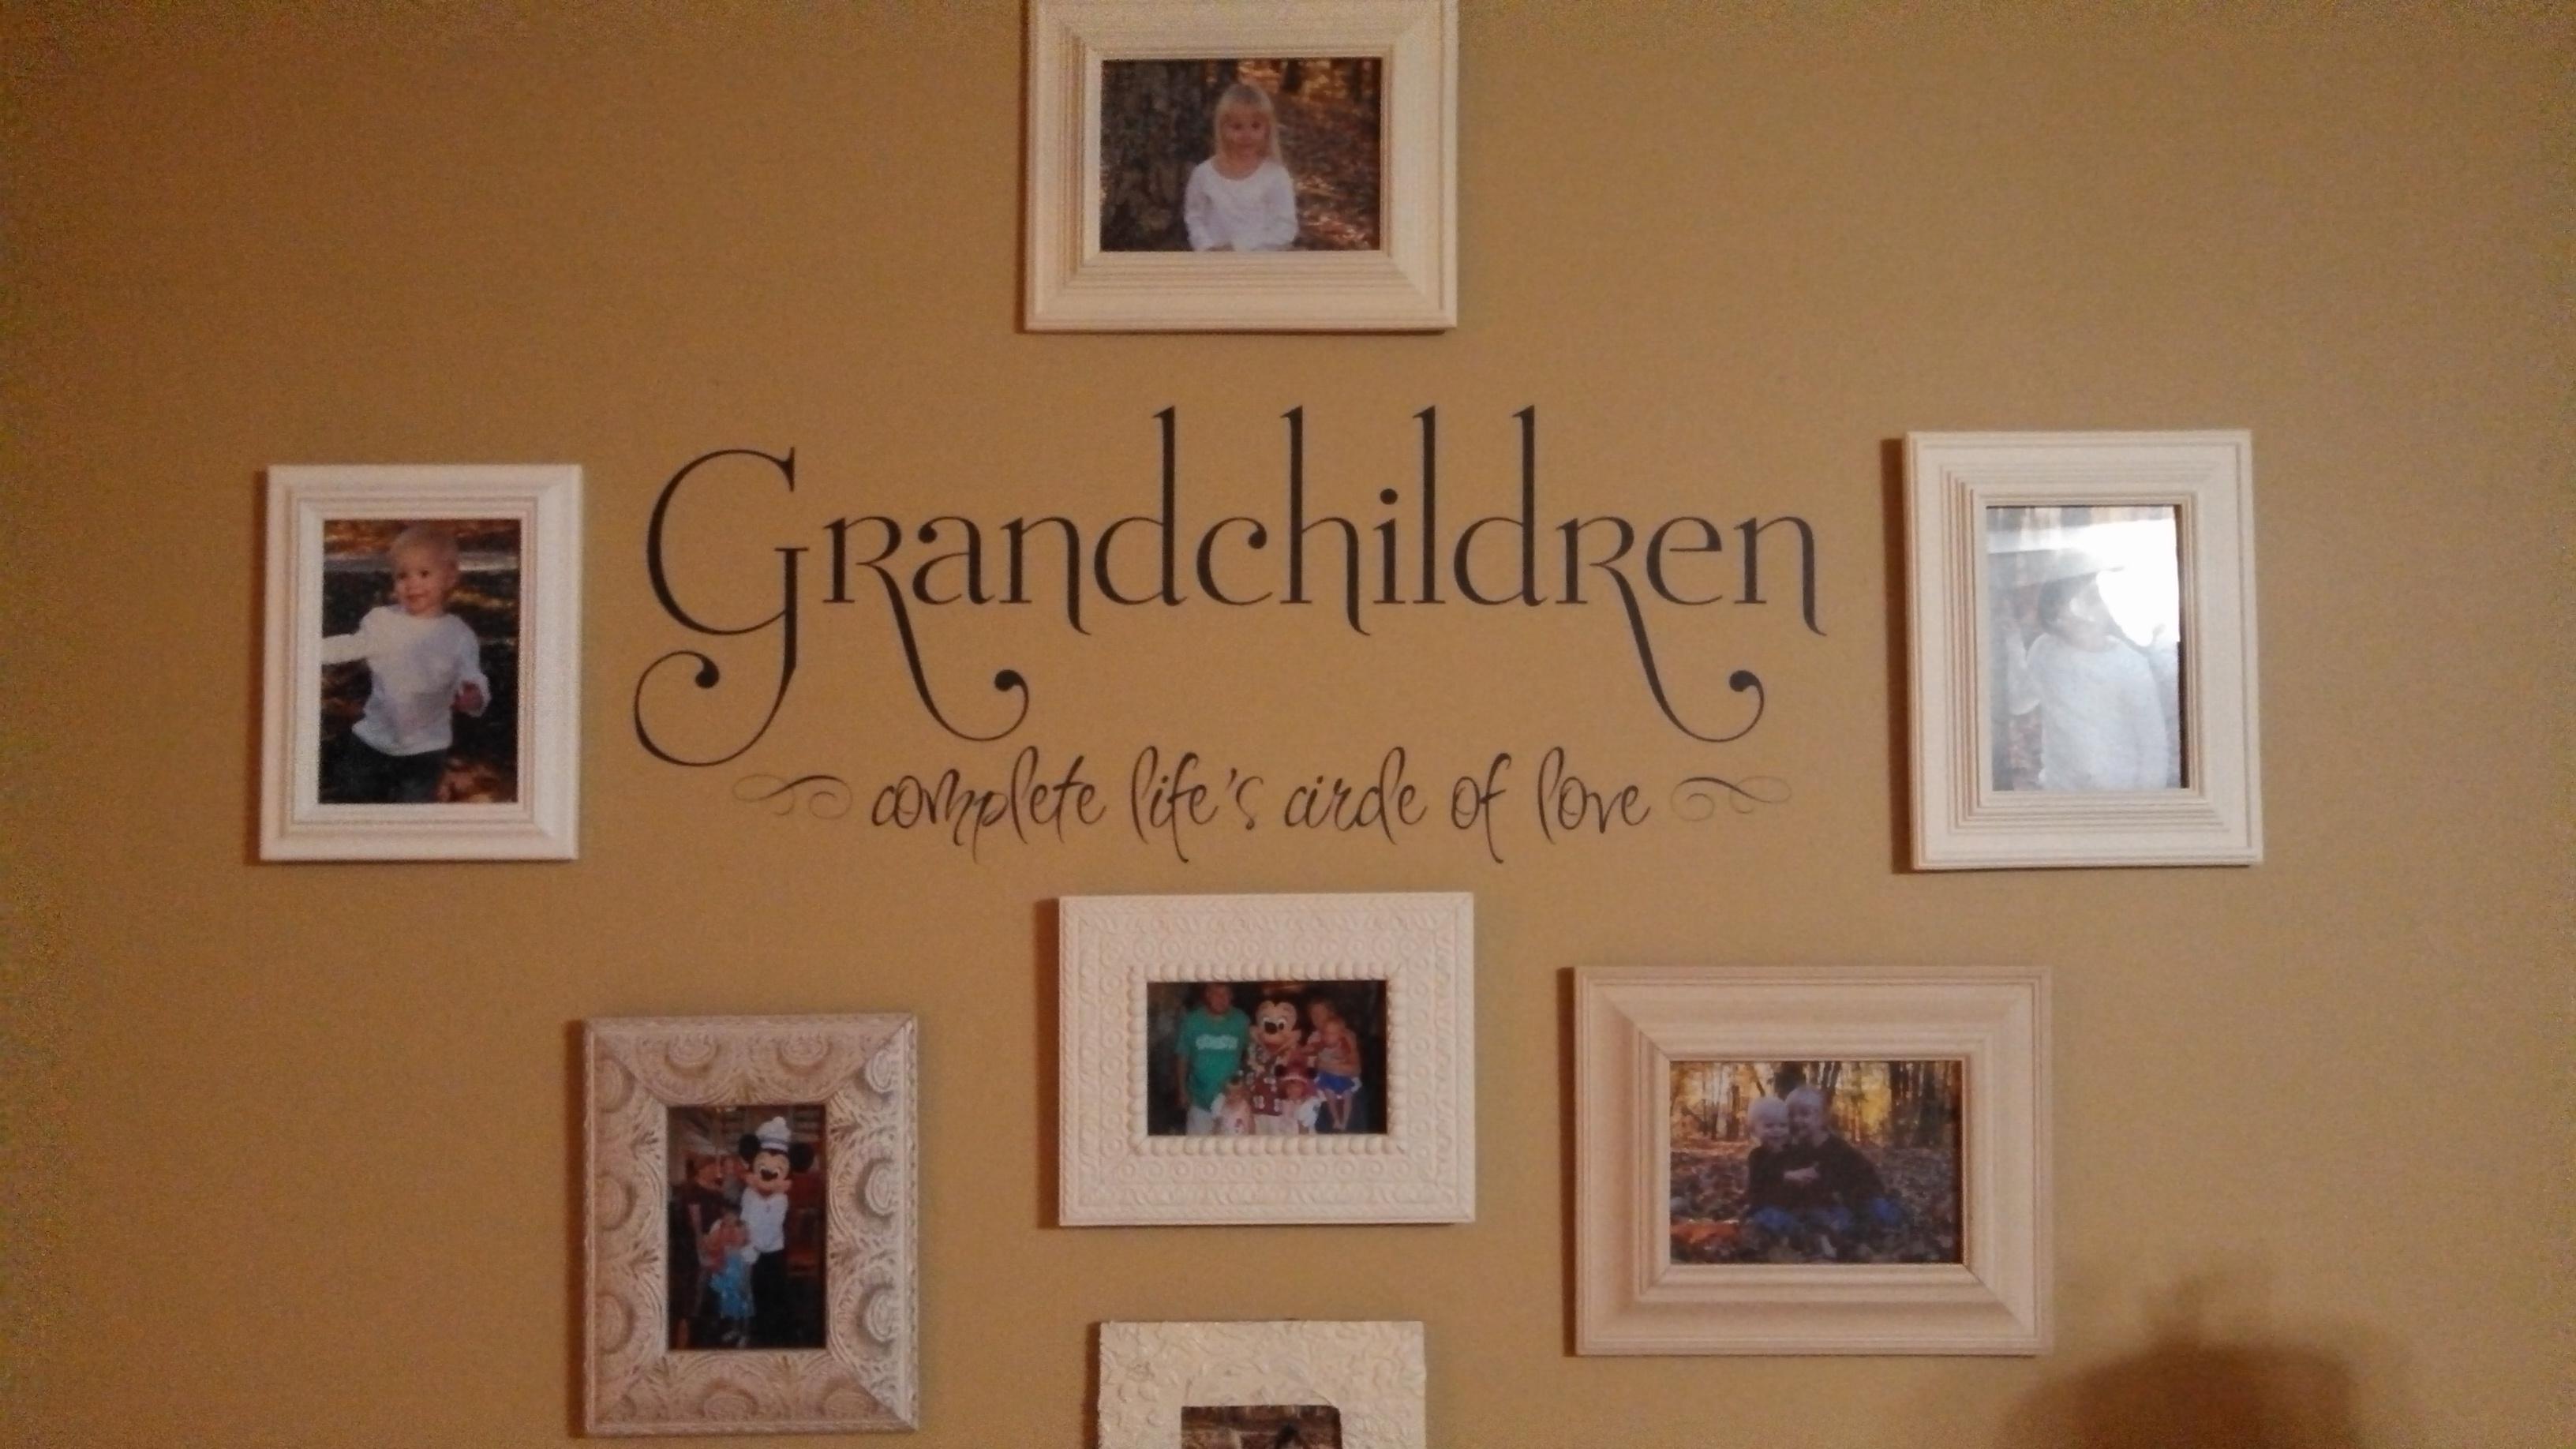 Grandchildren Complete Life's Circle Wall Decals